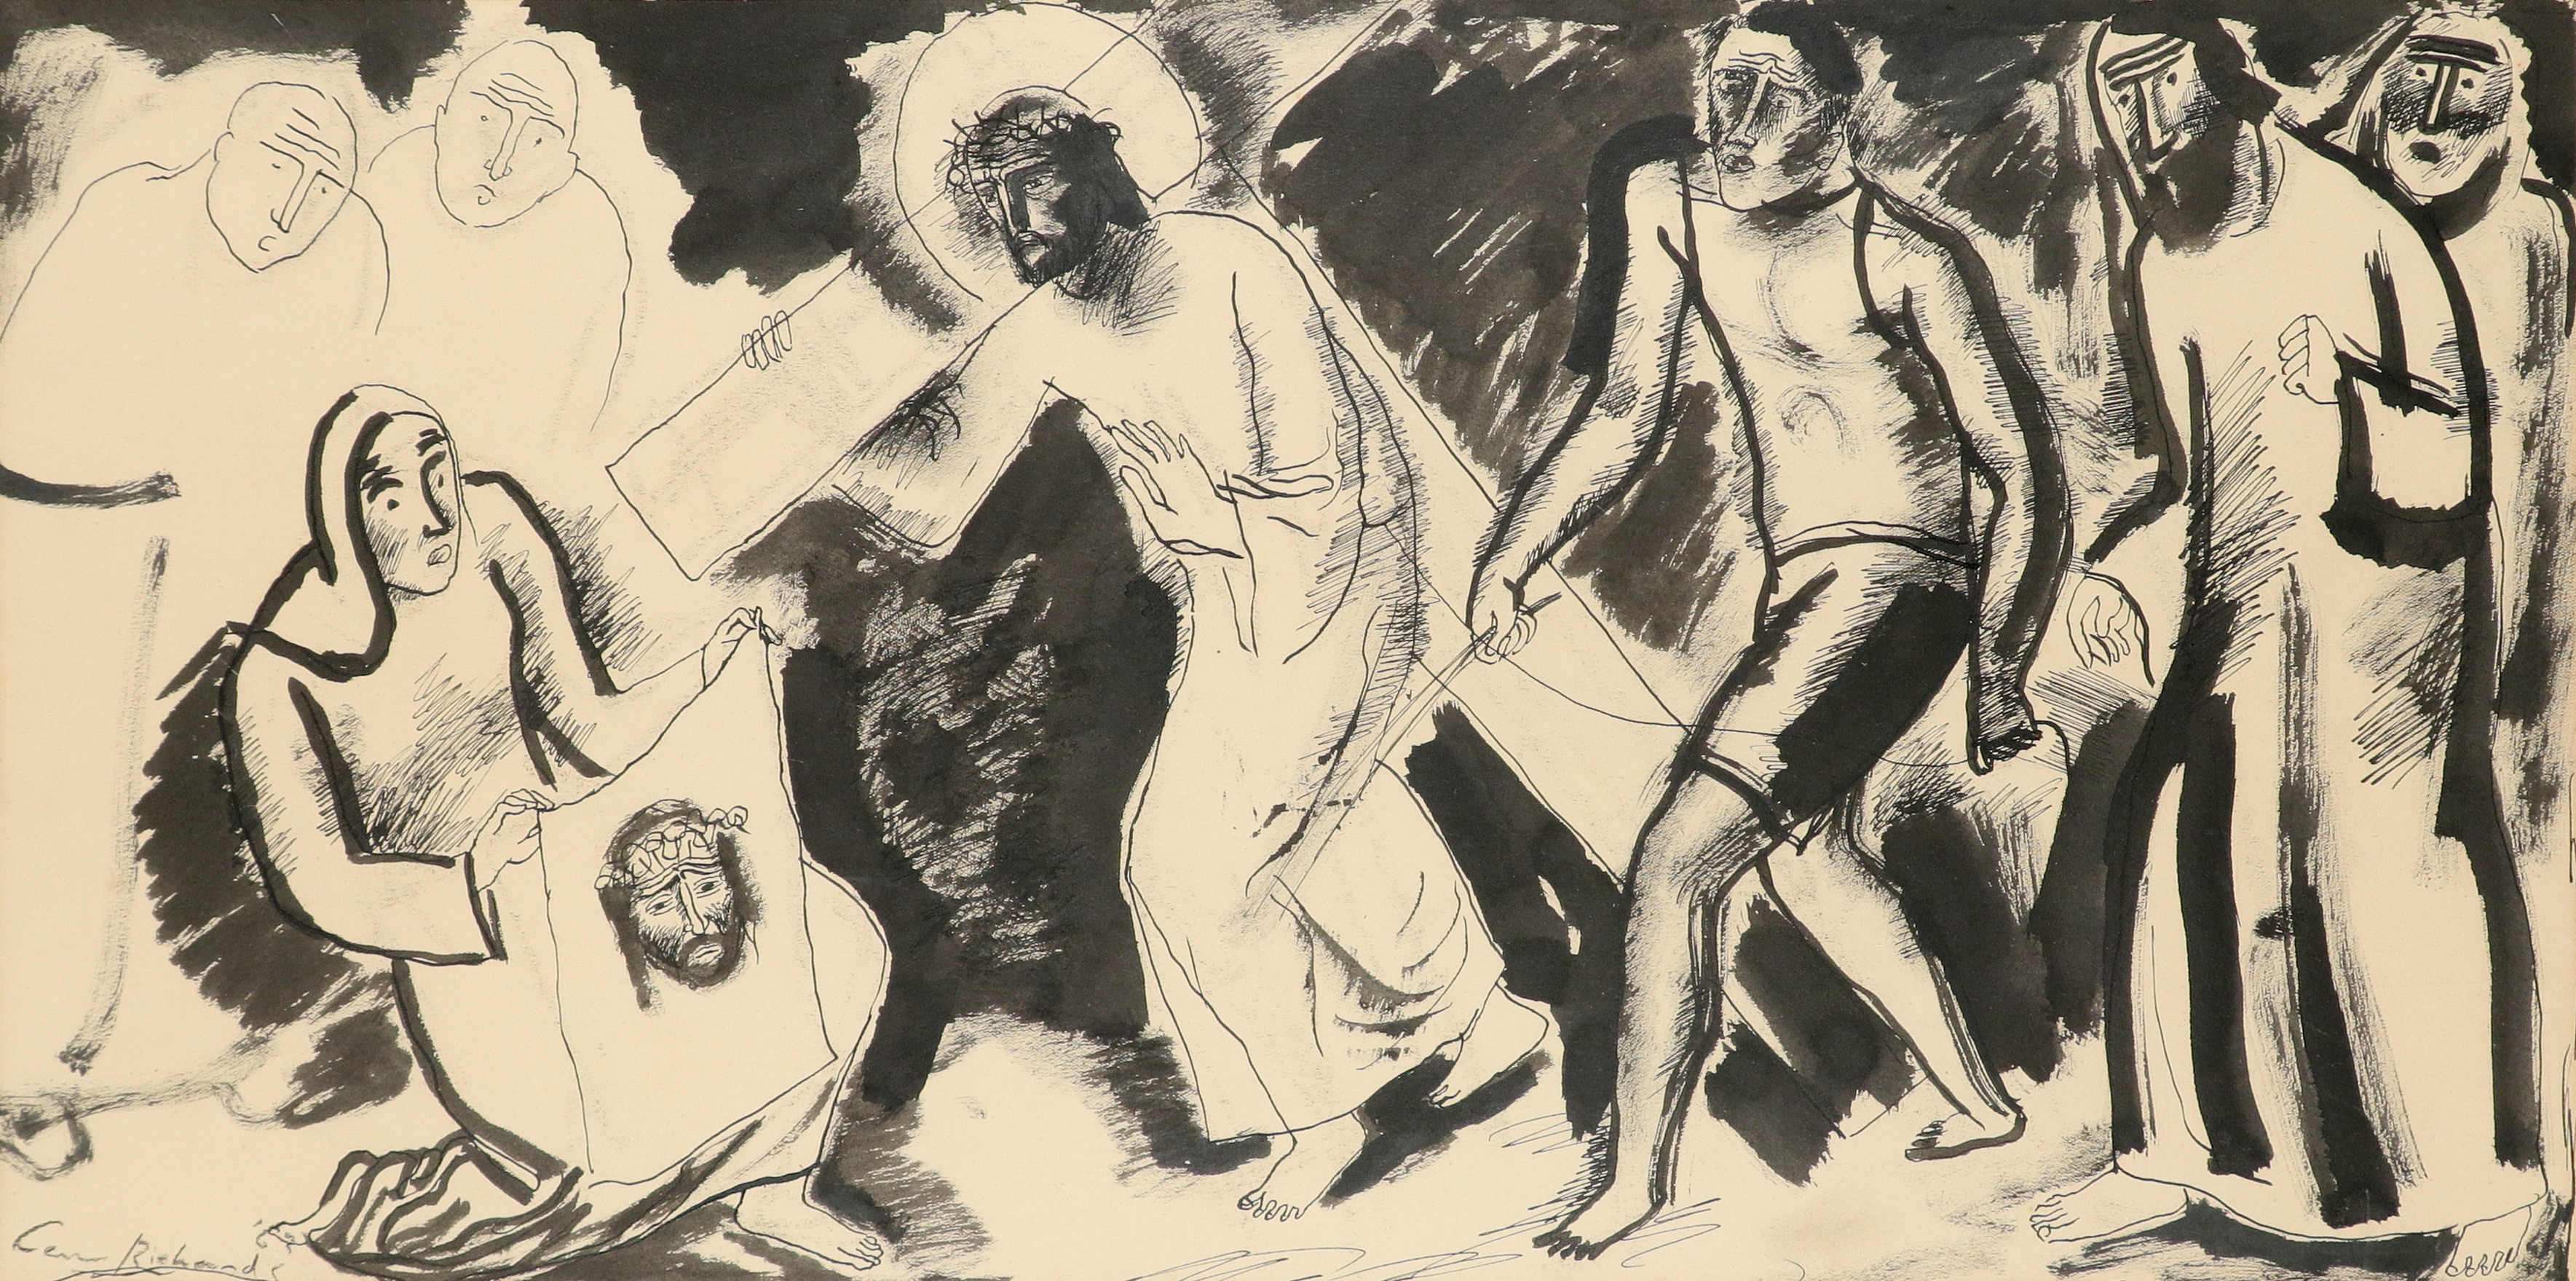 ‡Ceri Richards (Welsh 1903-1971) St. Veronica wipes the face of Jesus Signed Ceri Richards (lower